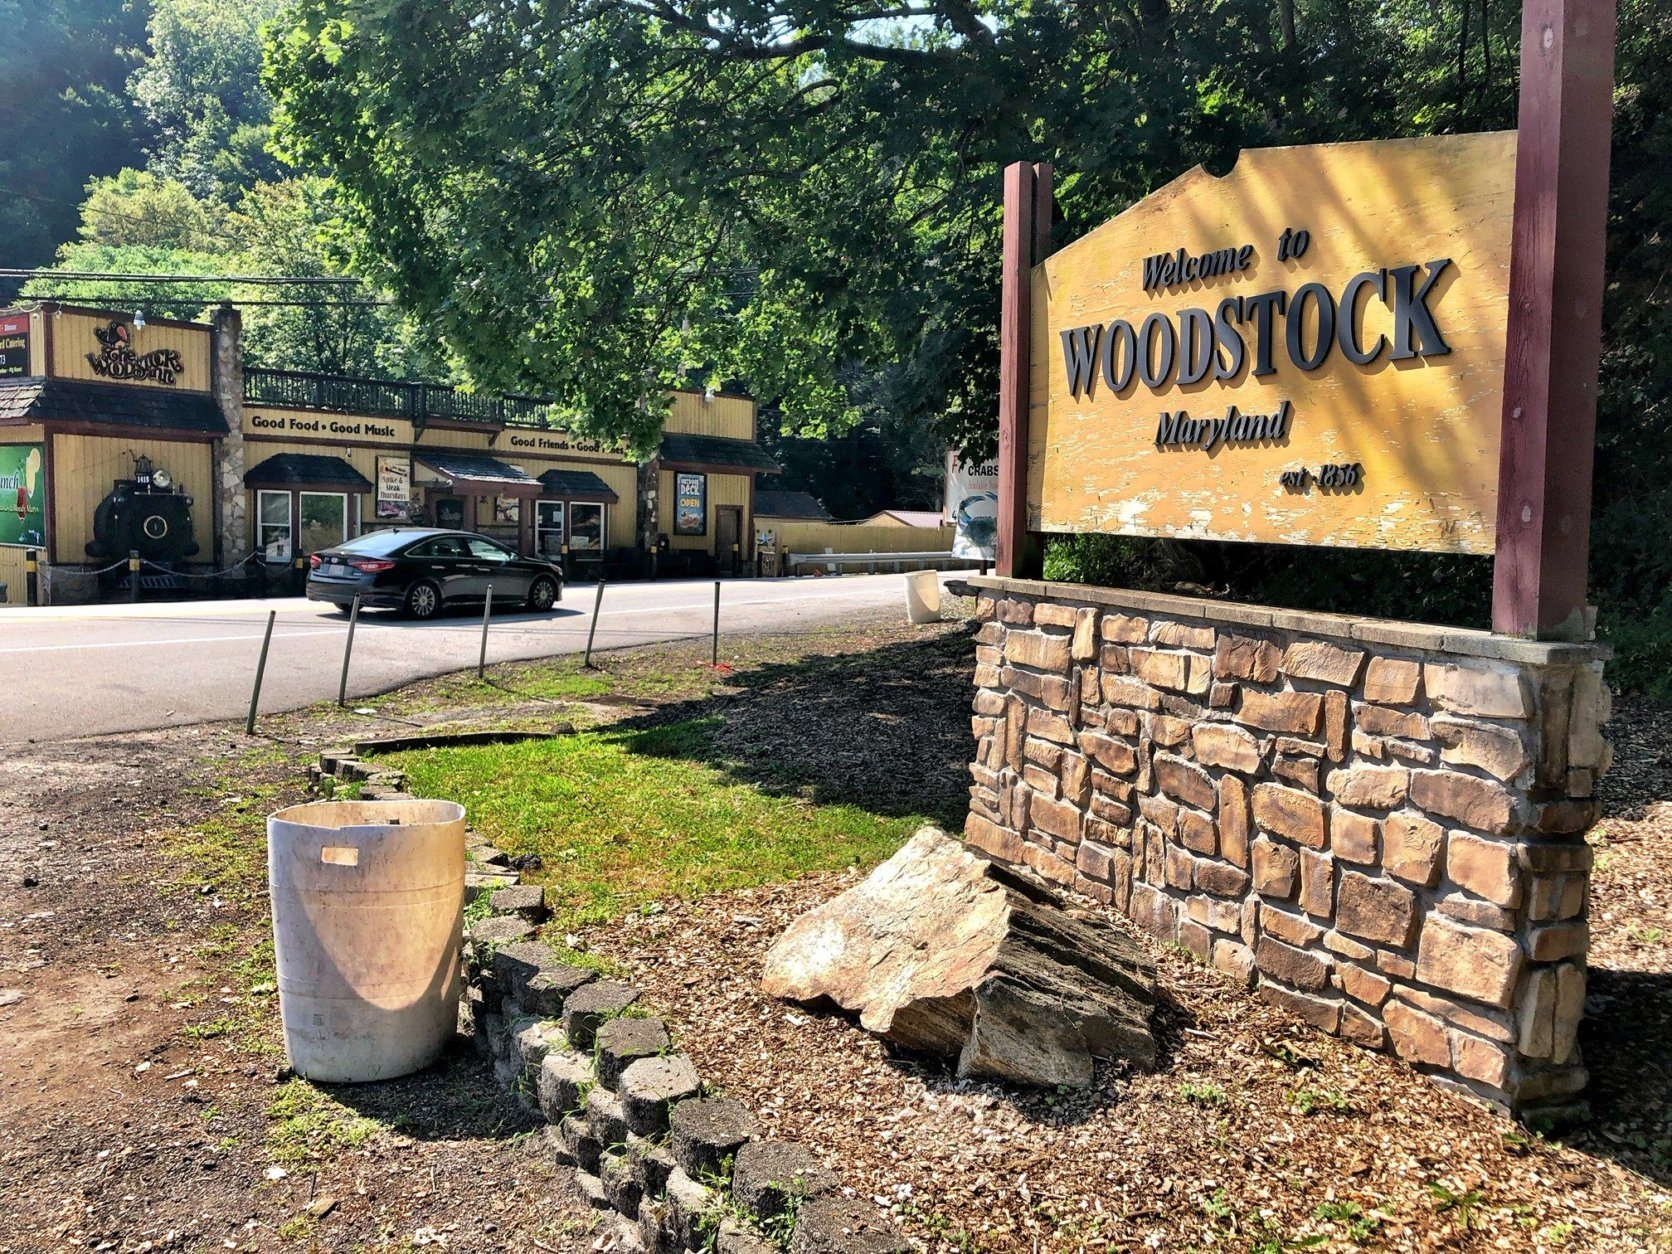 woodstock maryland sign